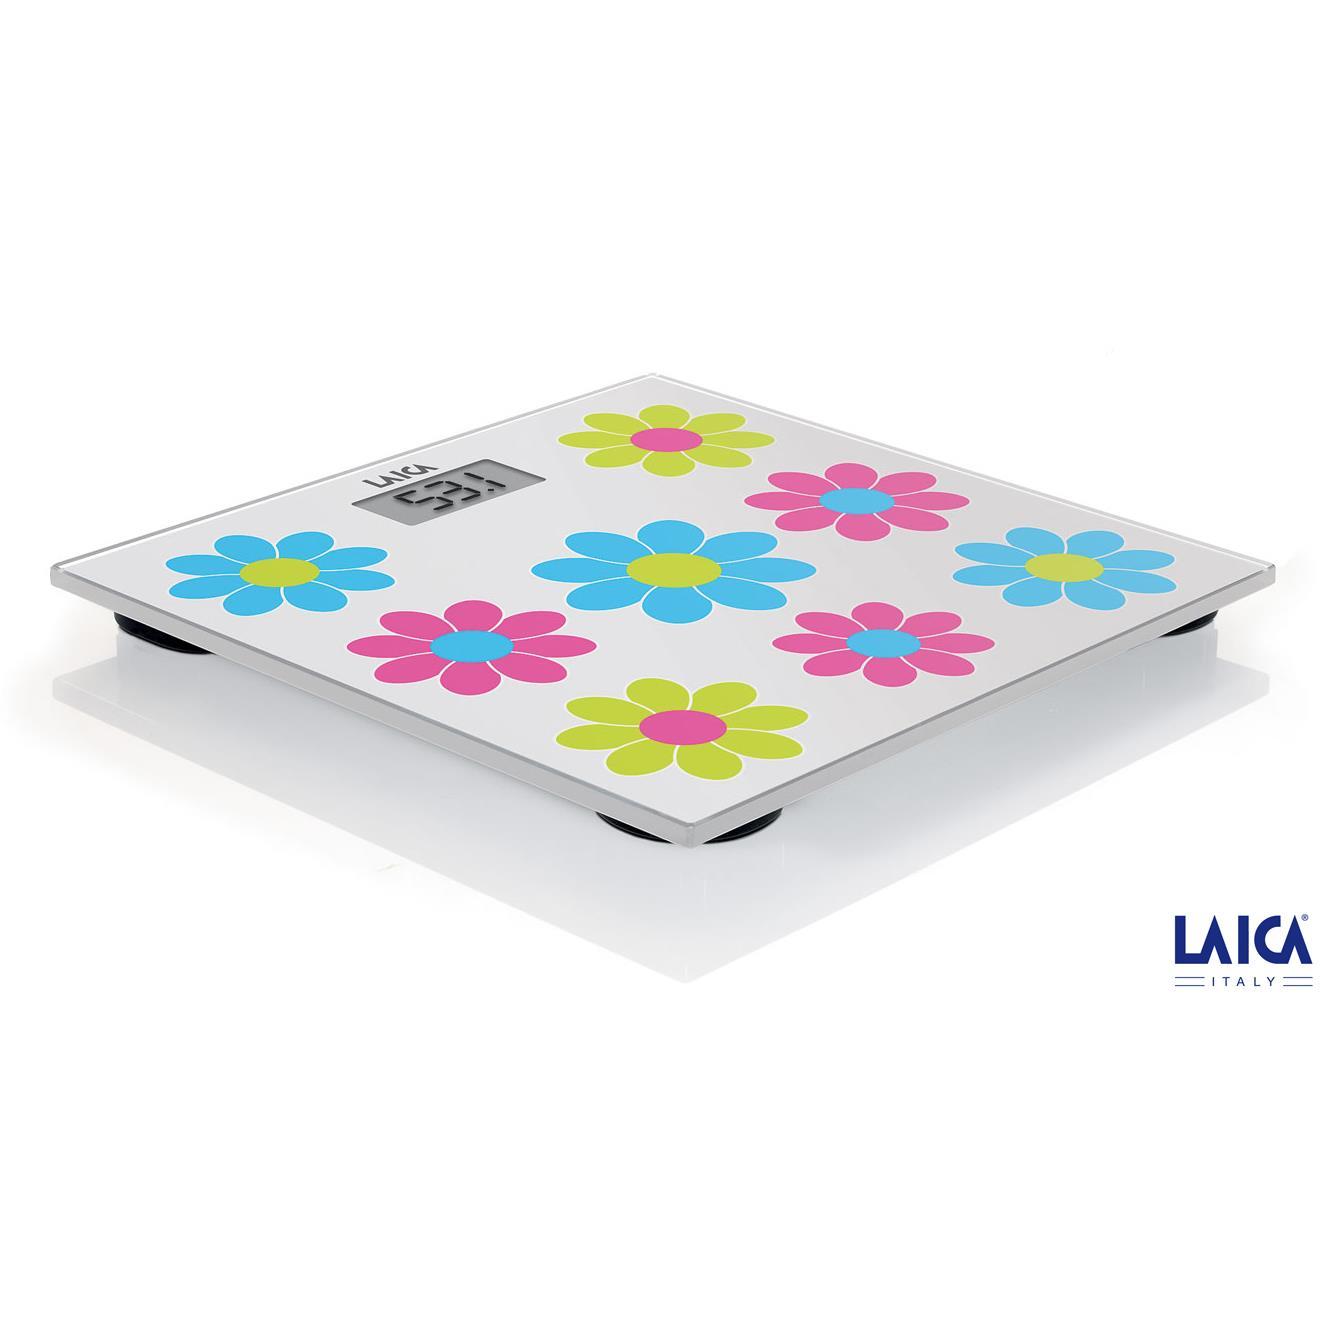 Cân Sức Khỏe Laica PS1050